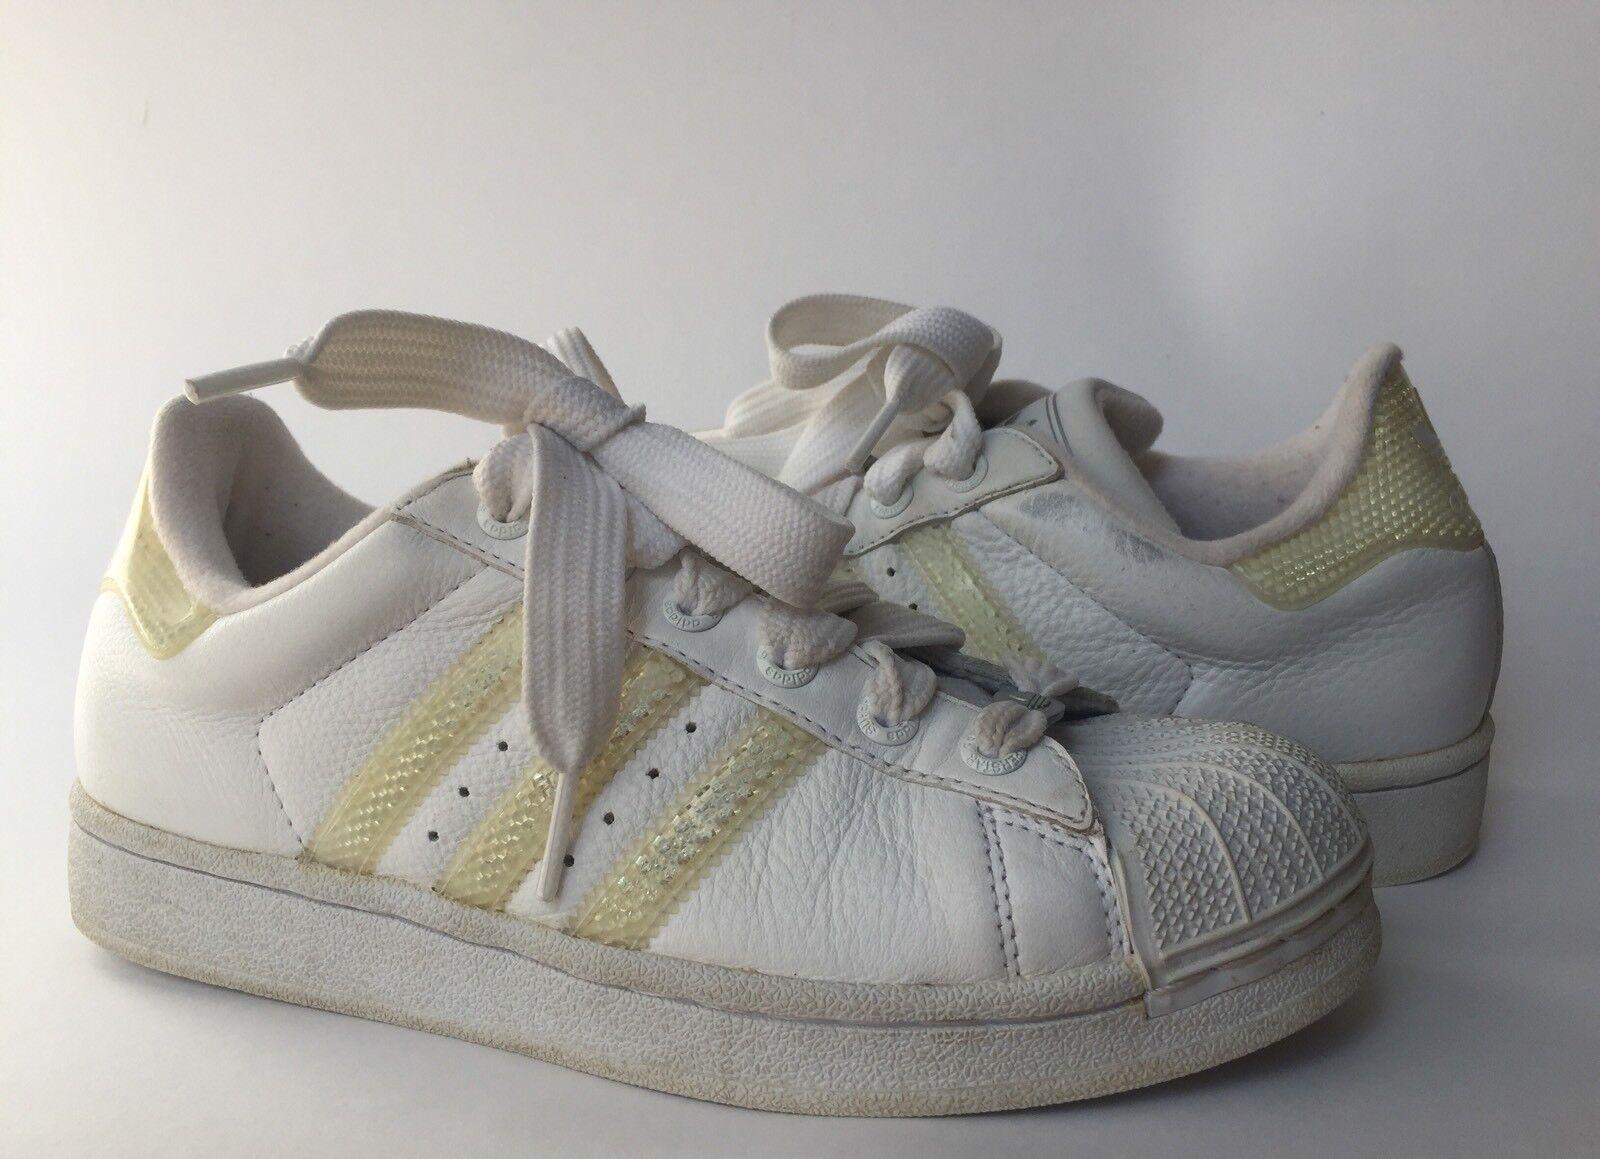 Adidas Superstar tennis Zapatos Blanco w / Reflective Reflective / Stripes US Mujer SZ 8 Vintage gran descuento f38aed